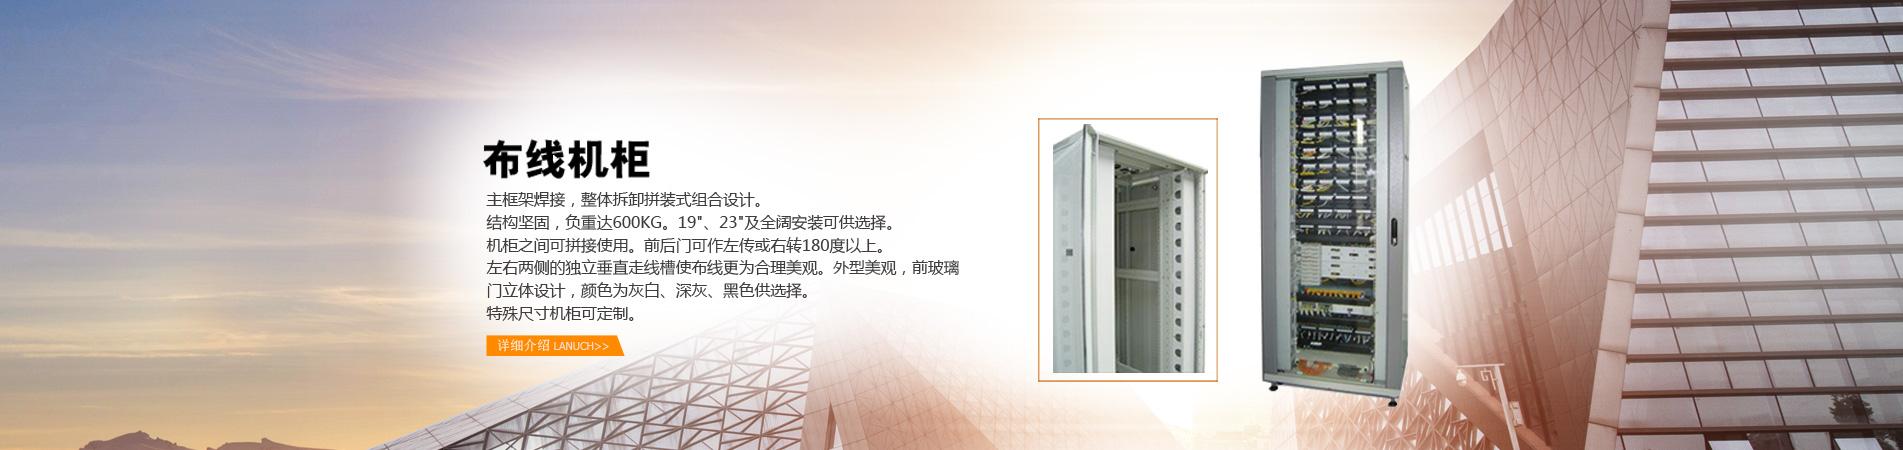 http://m.juhua358238.cn/03200123/php/pic.php?menuid=6&item1id=1&lang=0